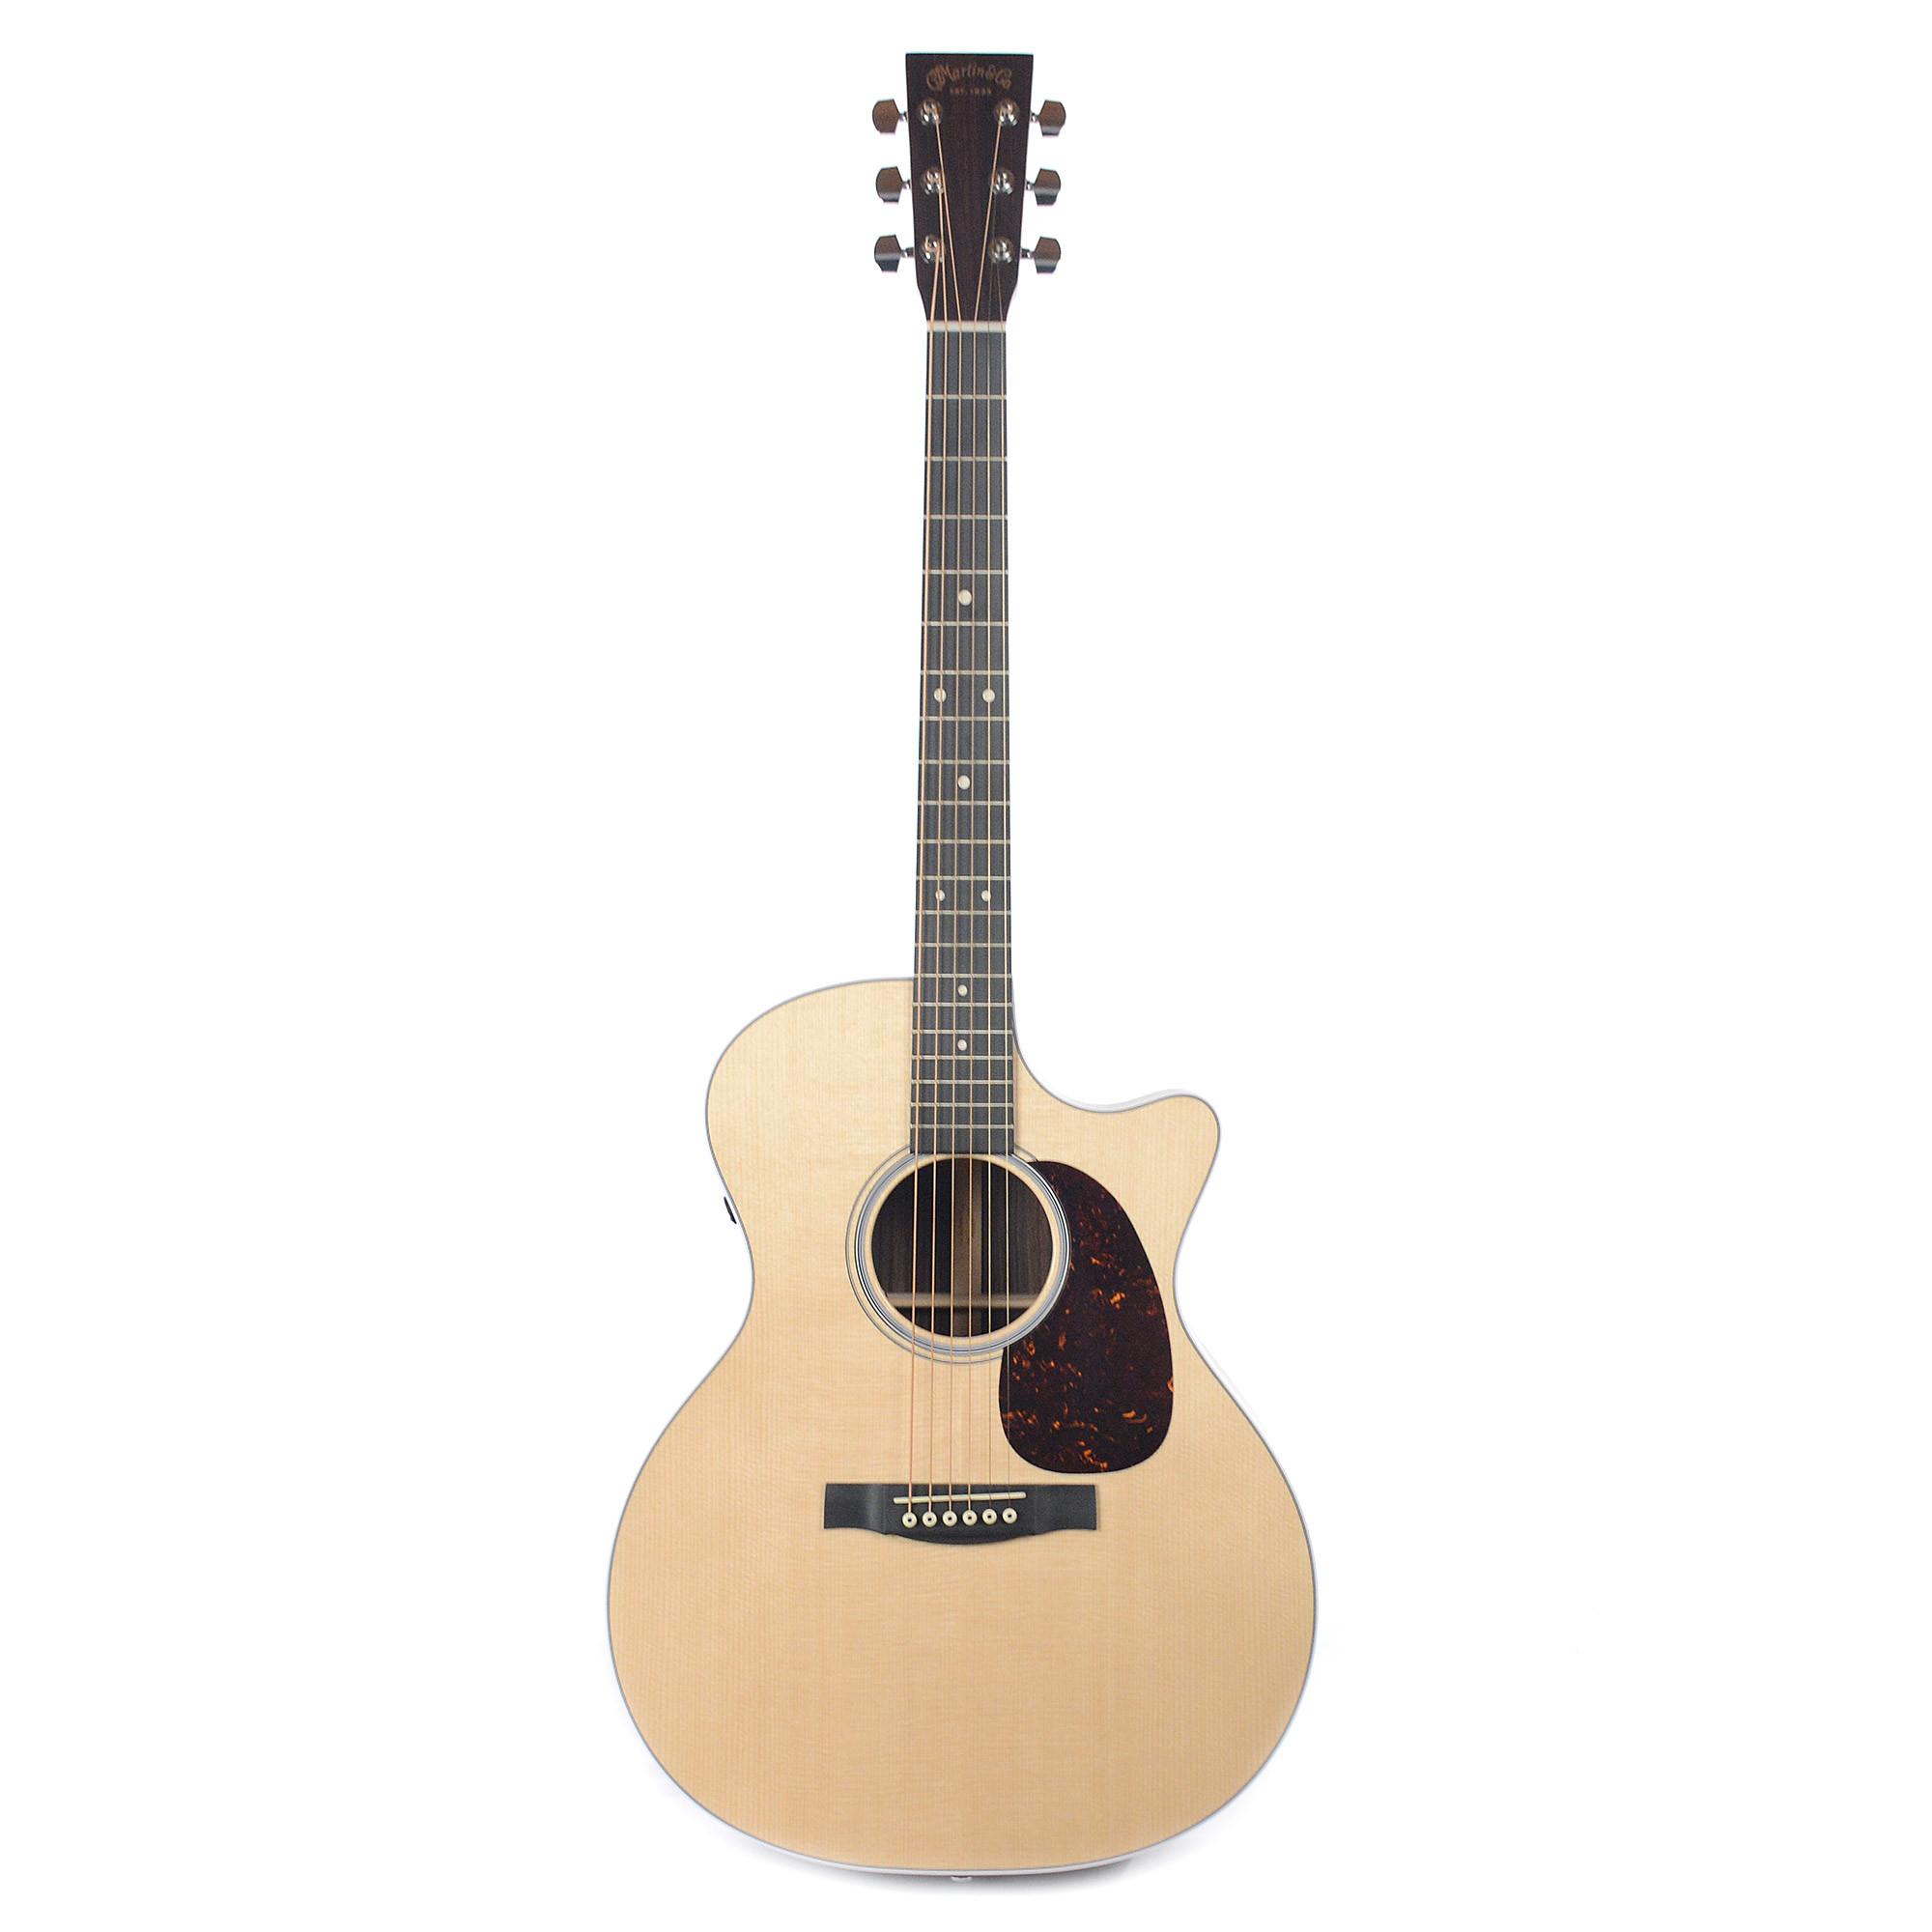 Martin guitar clipart.